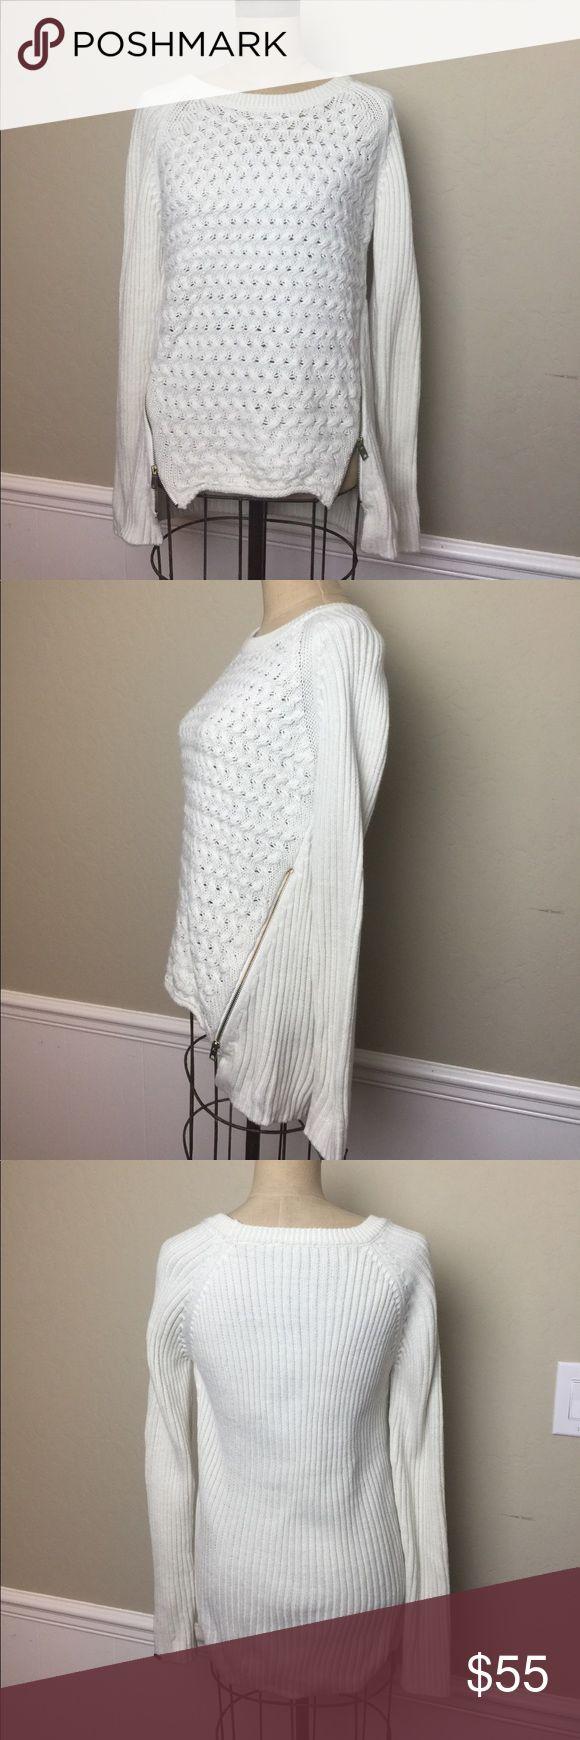 Dex multi pattern knit zip side sweater Fabulous multi patterned knit pull over sweater. Zip side detail. High low hem line. Long sleeves. Fabric tag is missing, but I believe it is an acrylic blend dex Sweaters